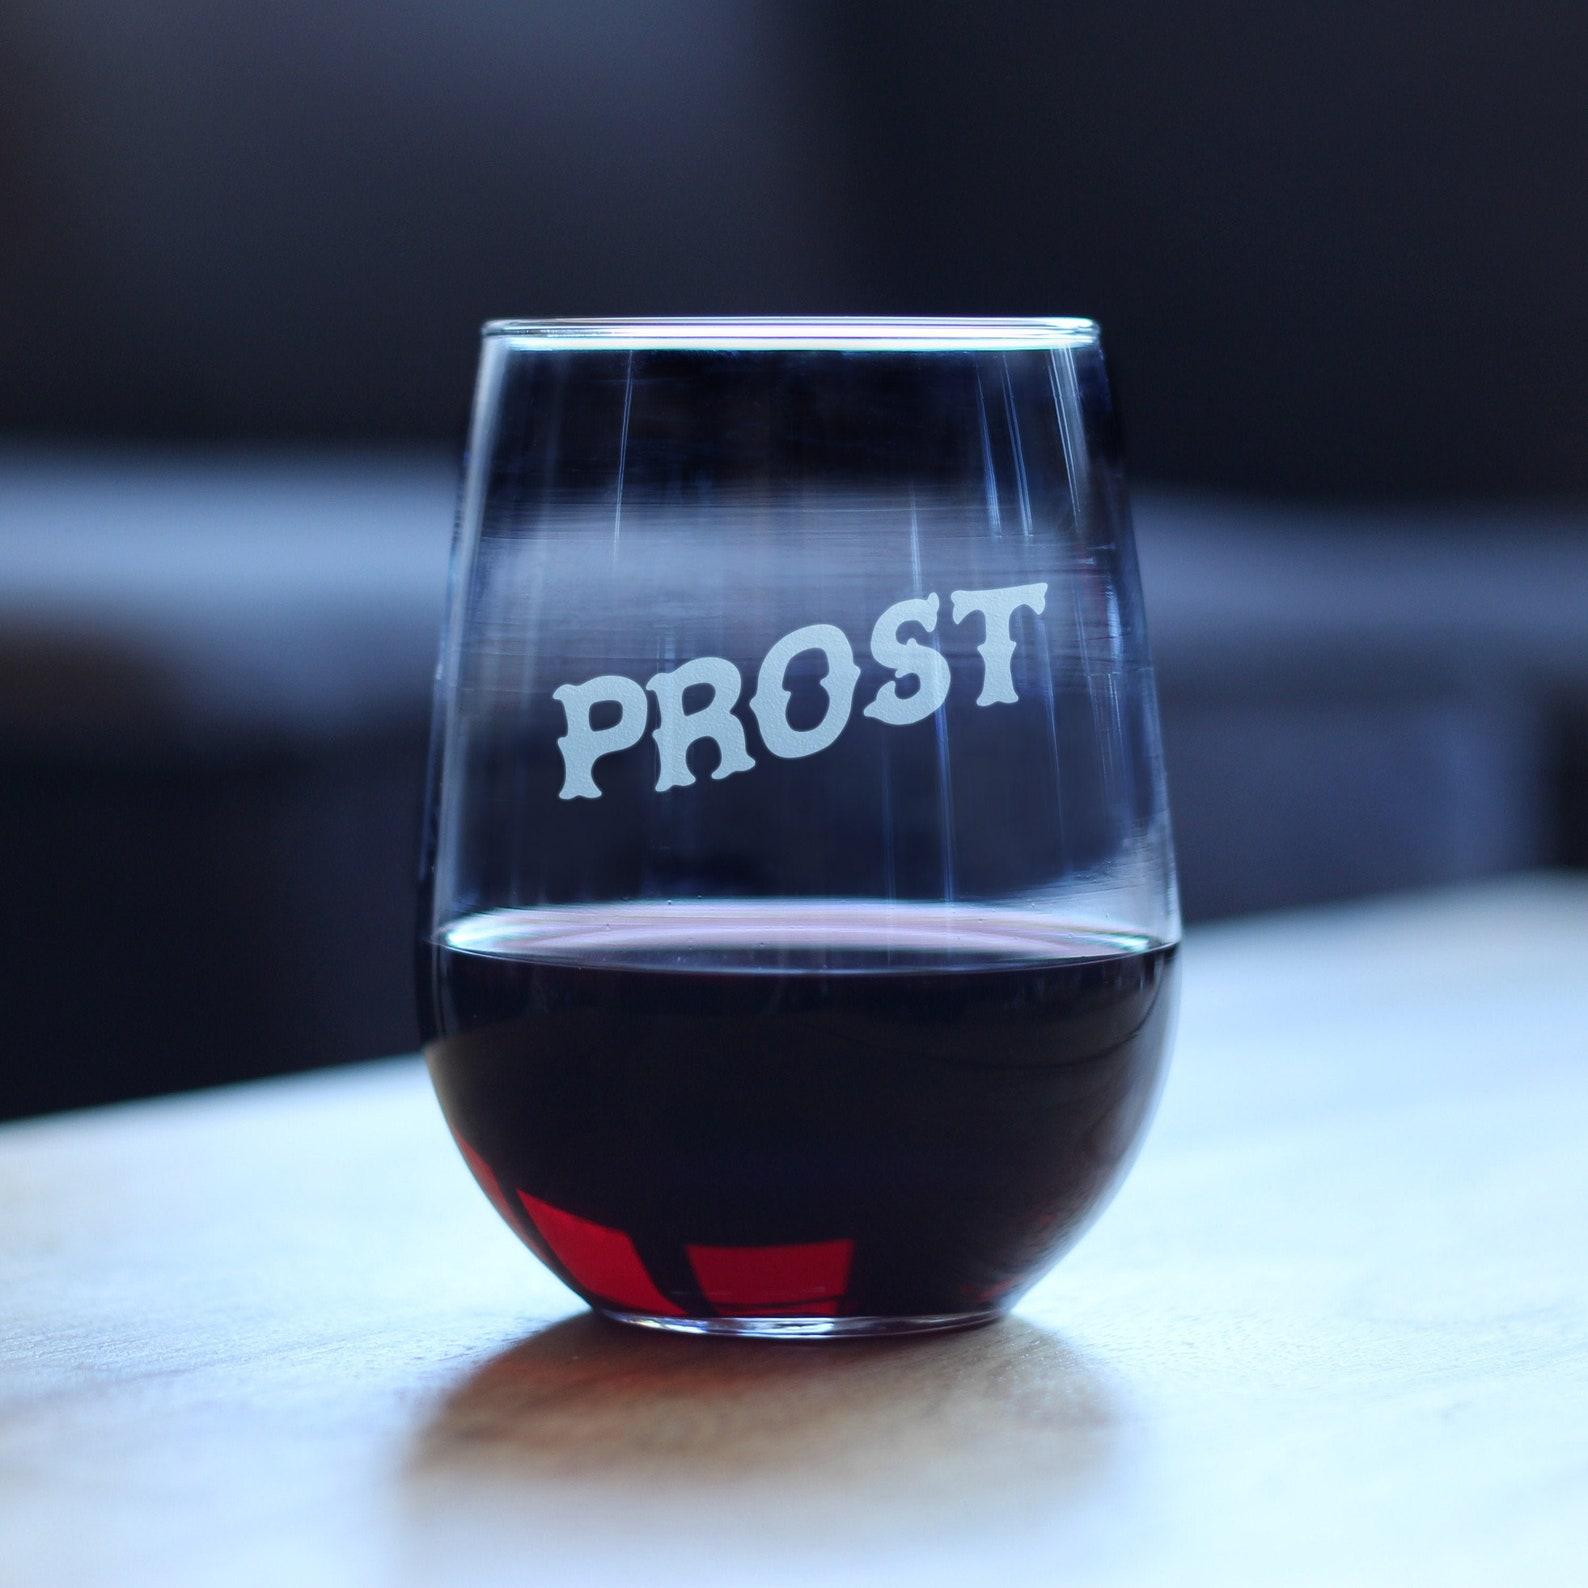 Prost - German Cheers